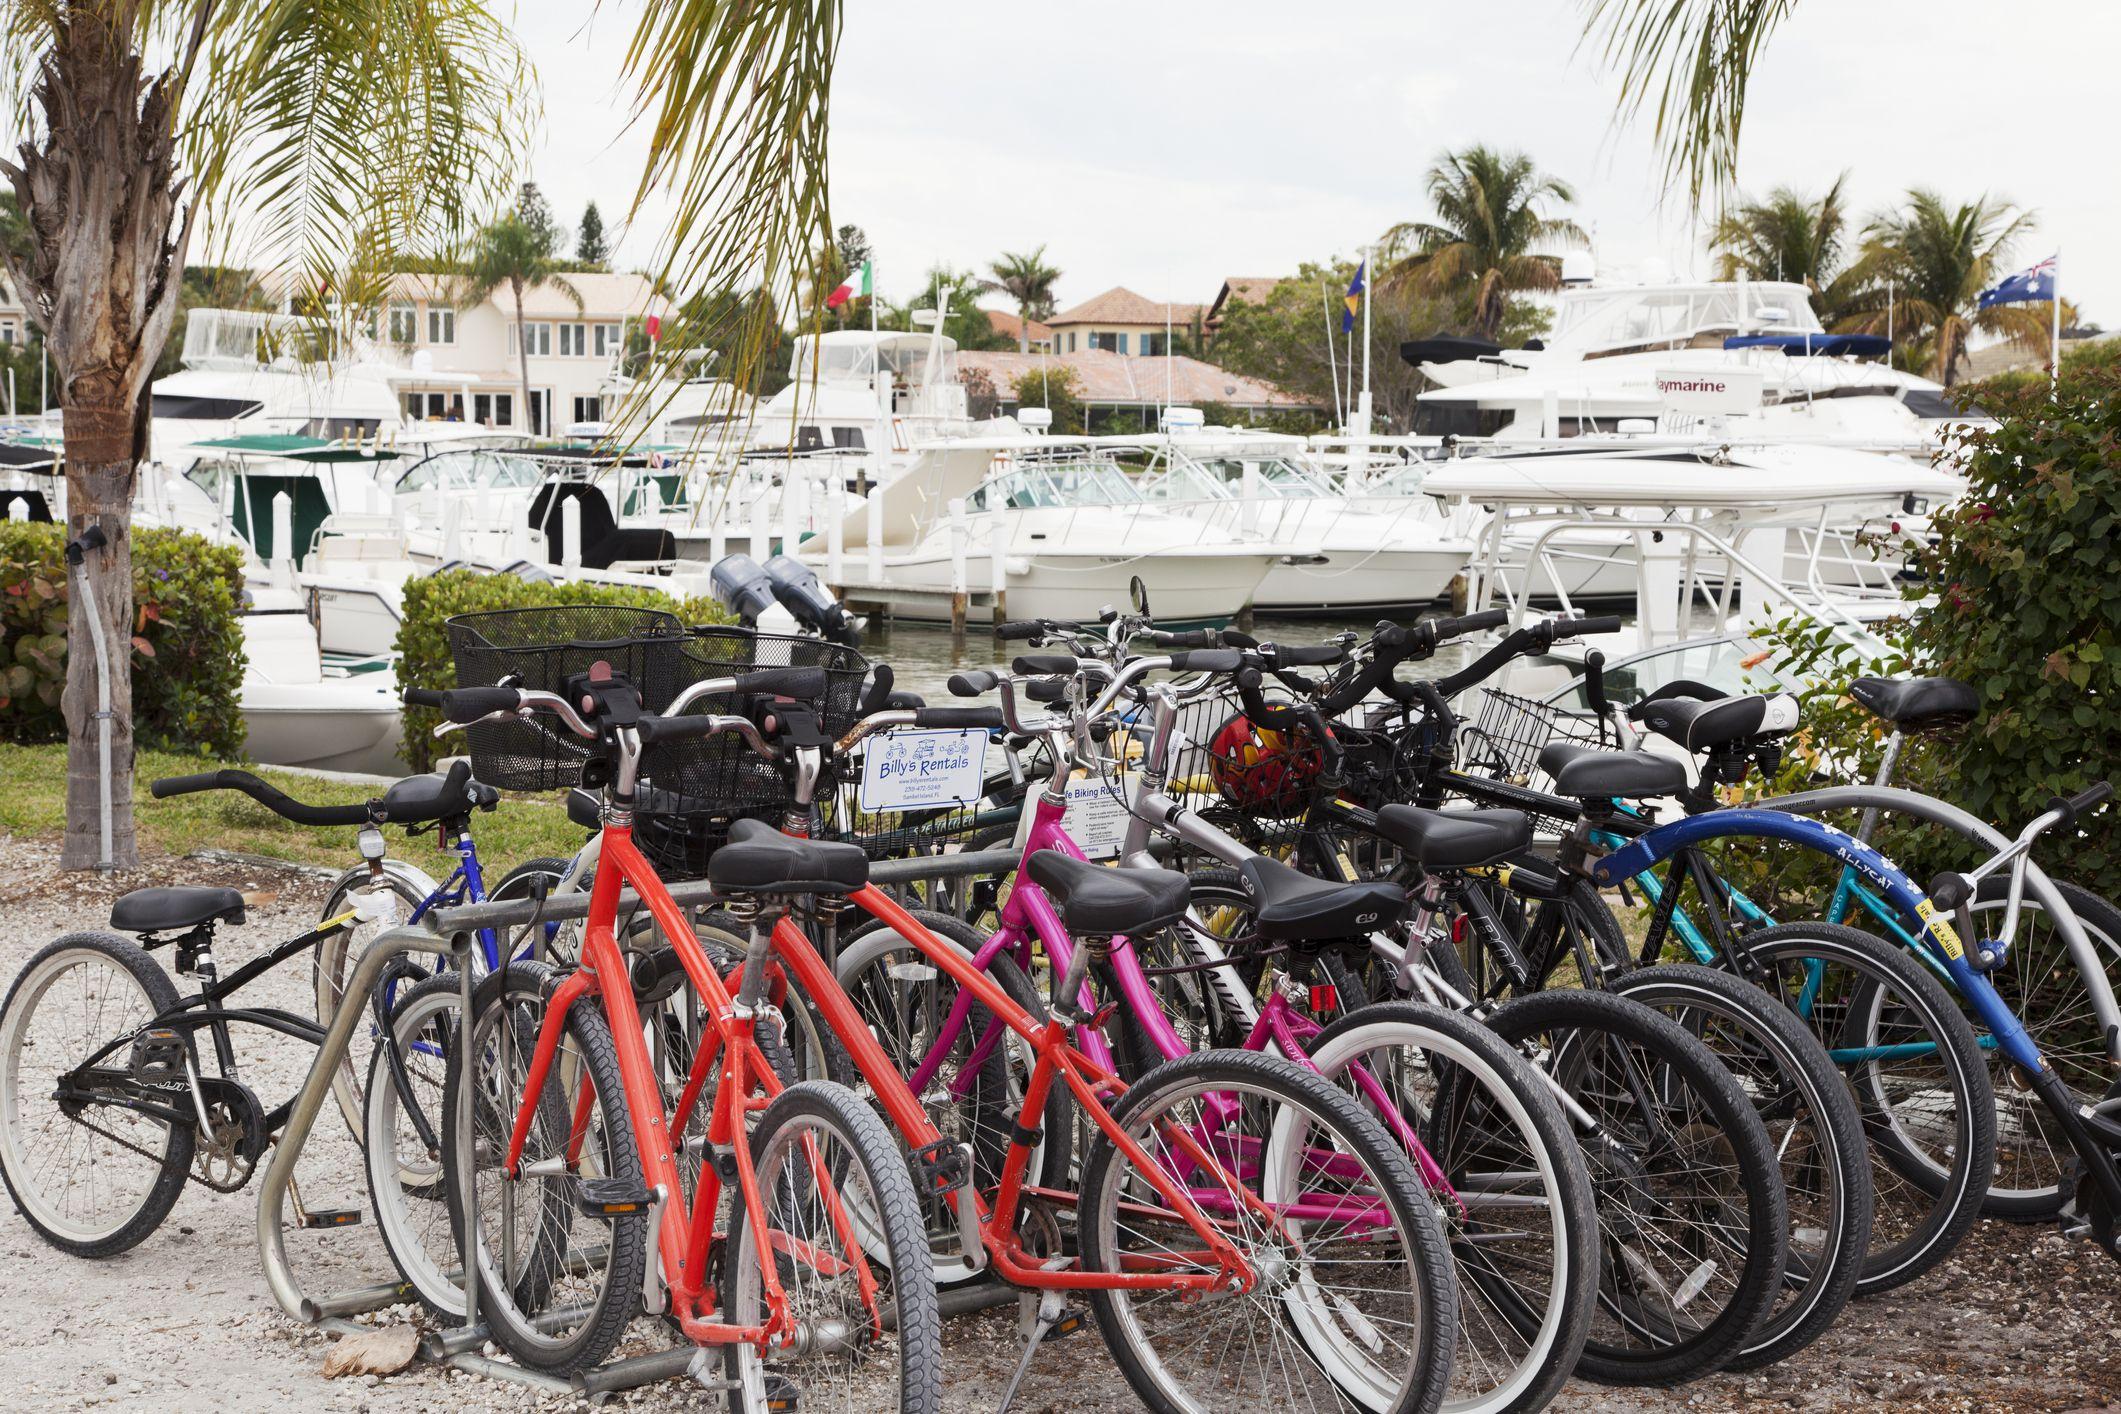 Rental bicycles and yachts sales on a Sanibel Yacht Marina